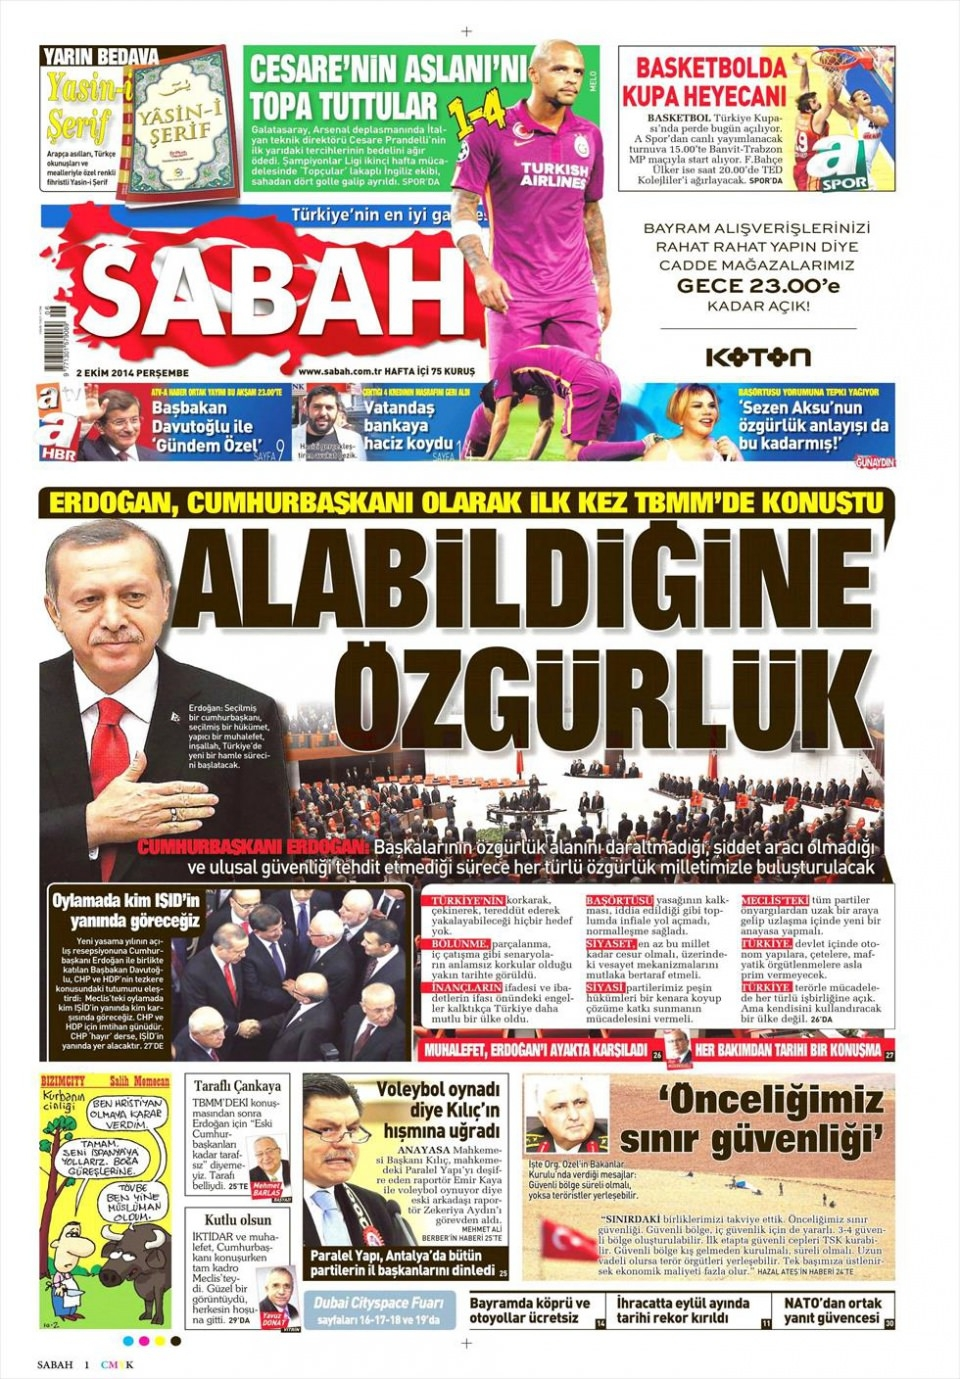 2 Ekim 2014 gazete manşetleri 15